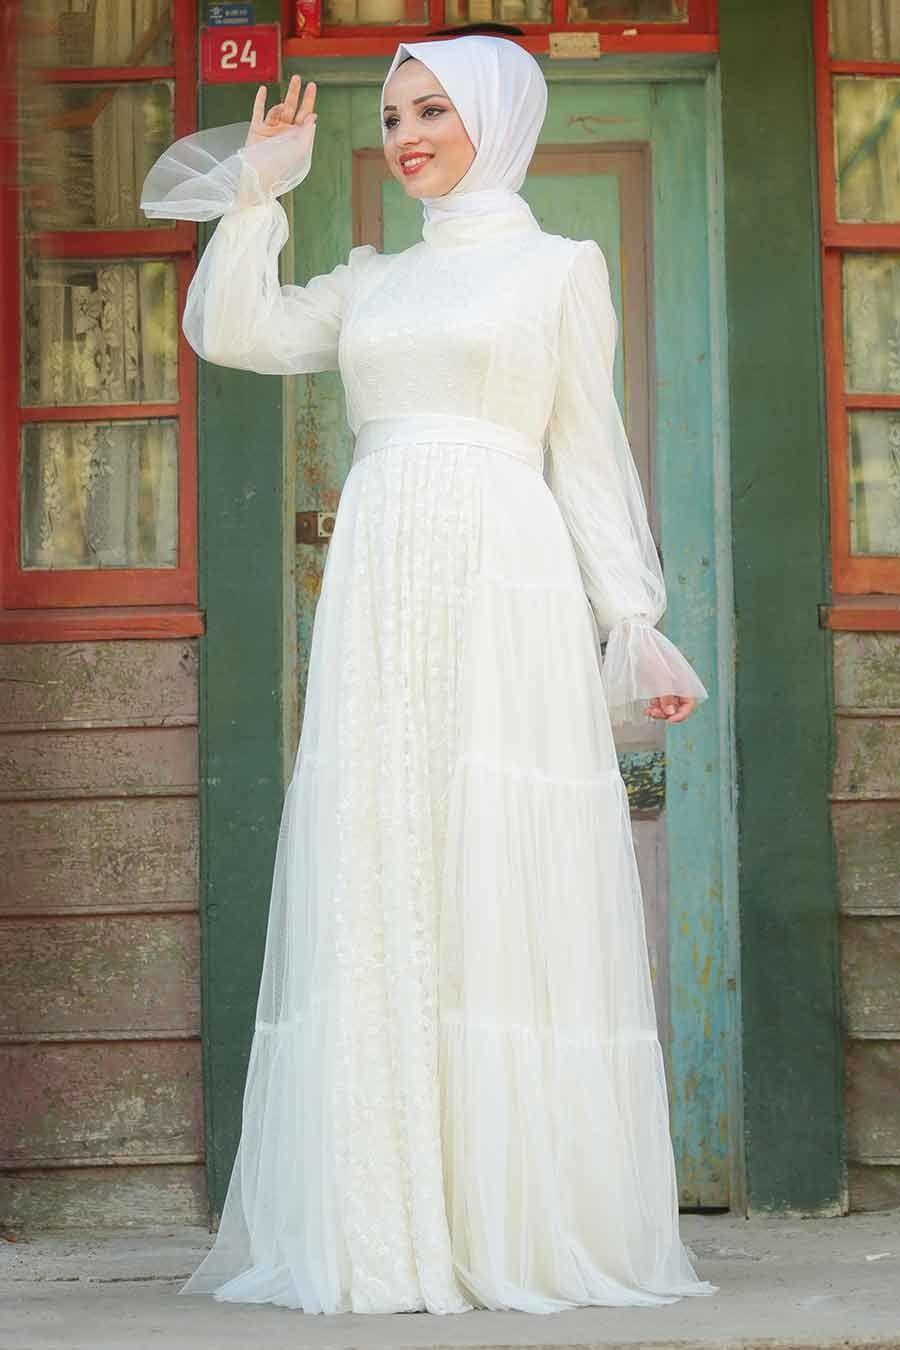 Tesetturlu Abiye Elbise Kusakli Ekru Tesettur Abiye Elbise 3963e Tesetturisland Com Elbise Elbise Dugun Kiyafet